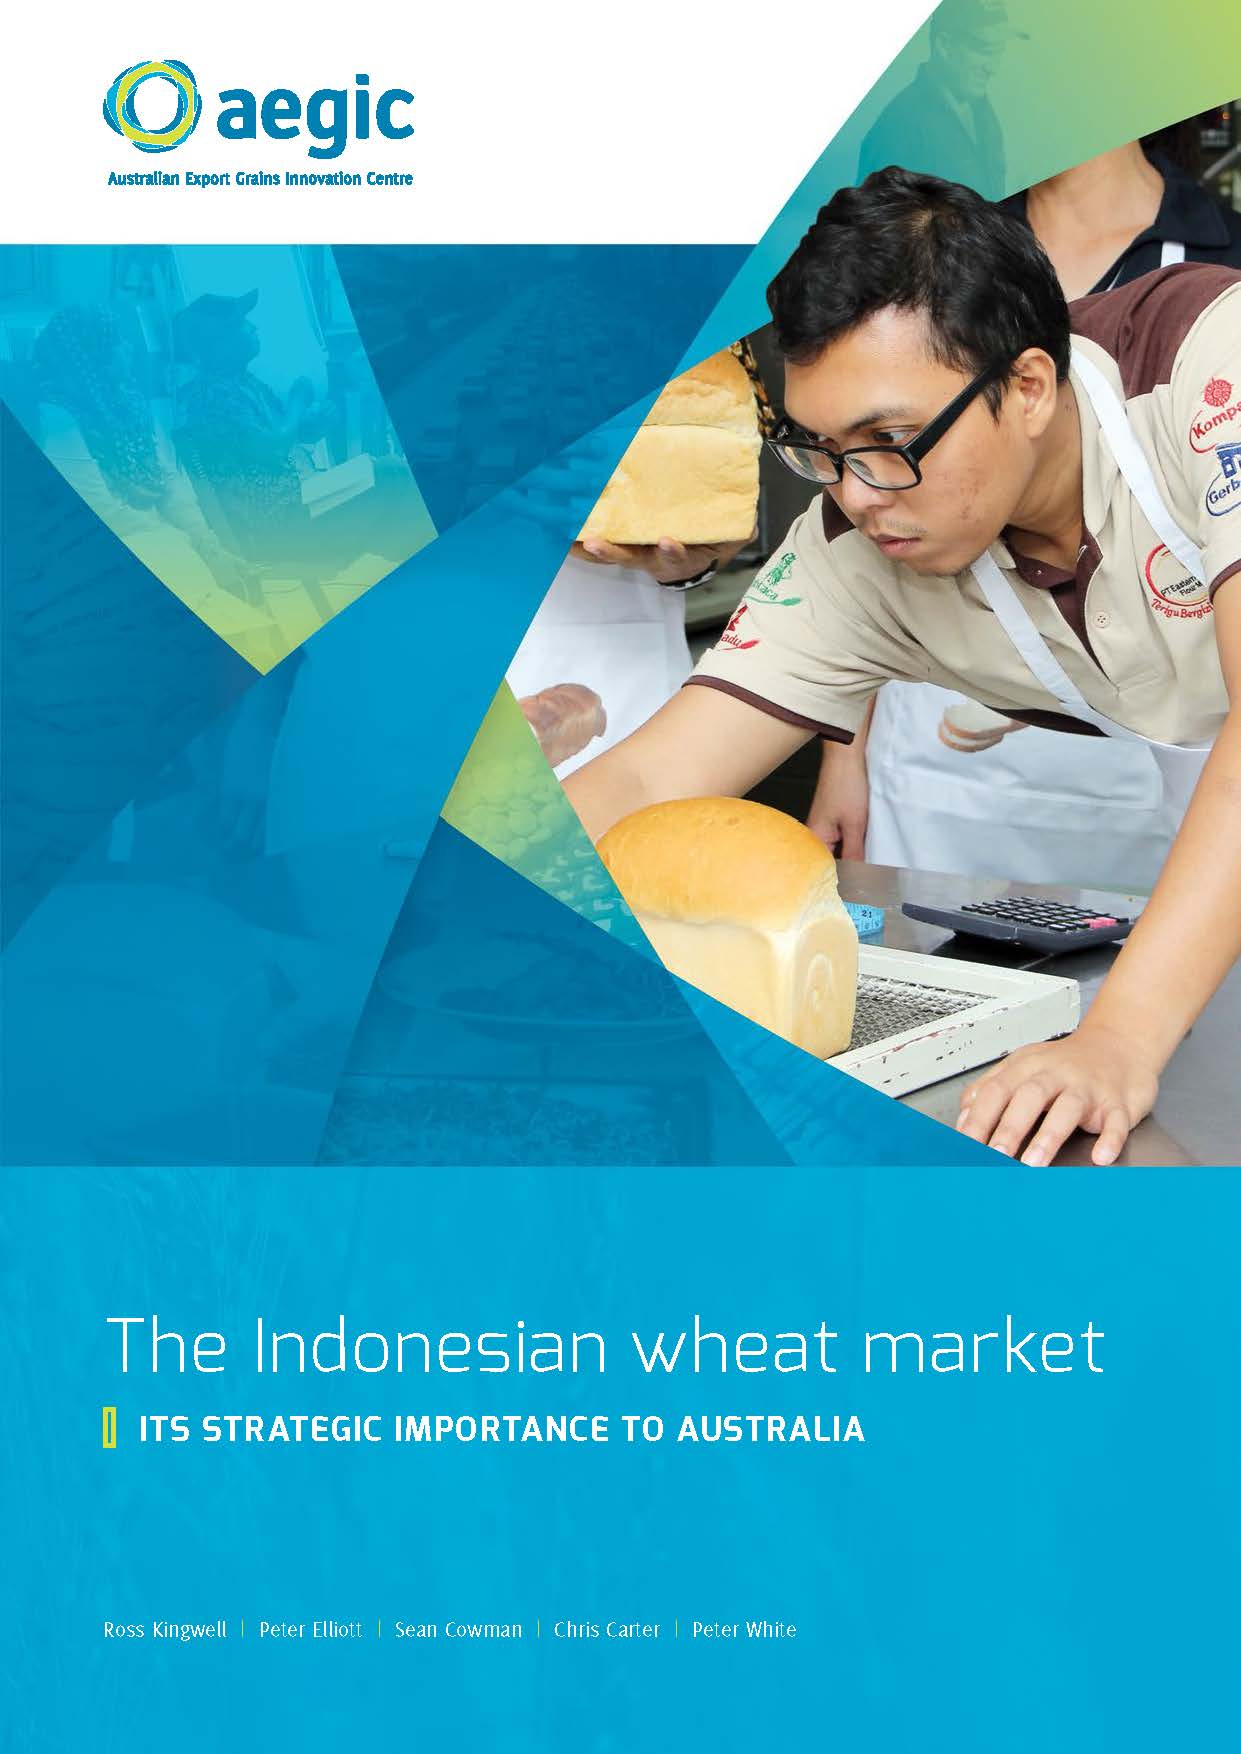 AEGIC-The-Indonesian-wheat-market-its-strategic-importance-to-Australia___Page_01.jpg